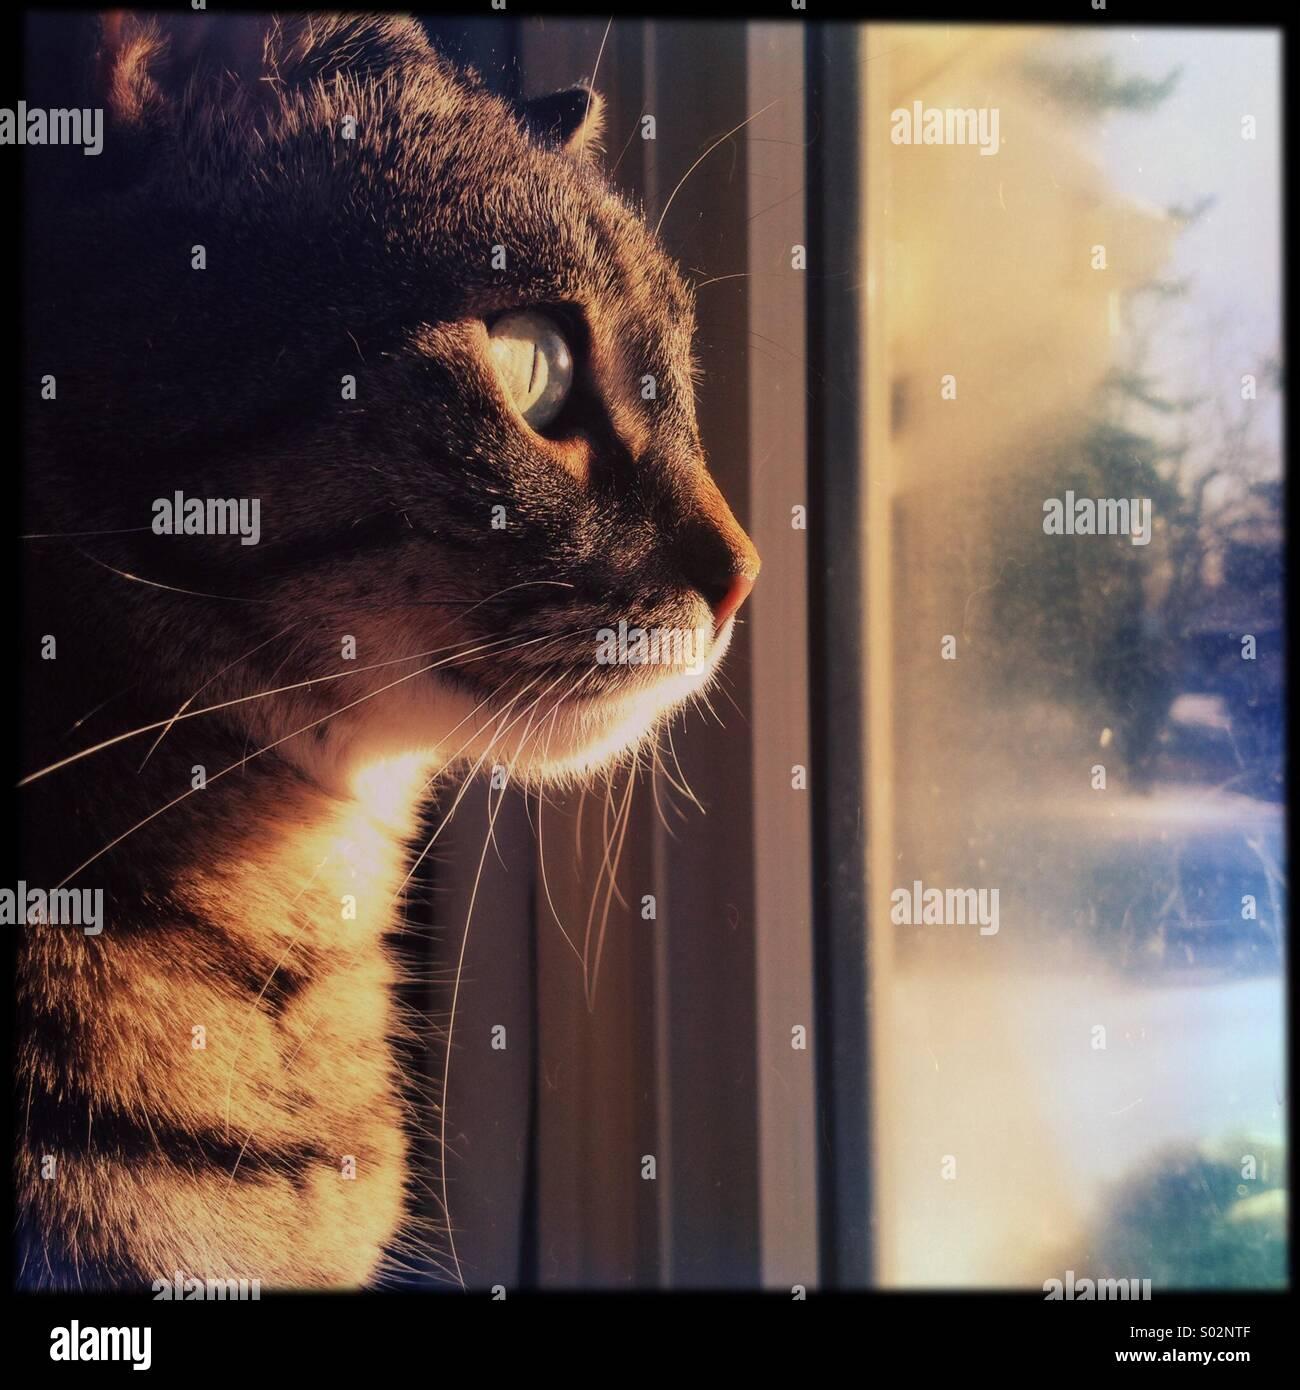 Good morning kitty - Stock Image